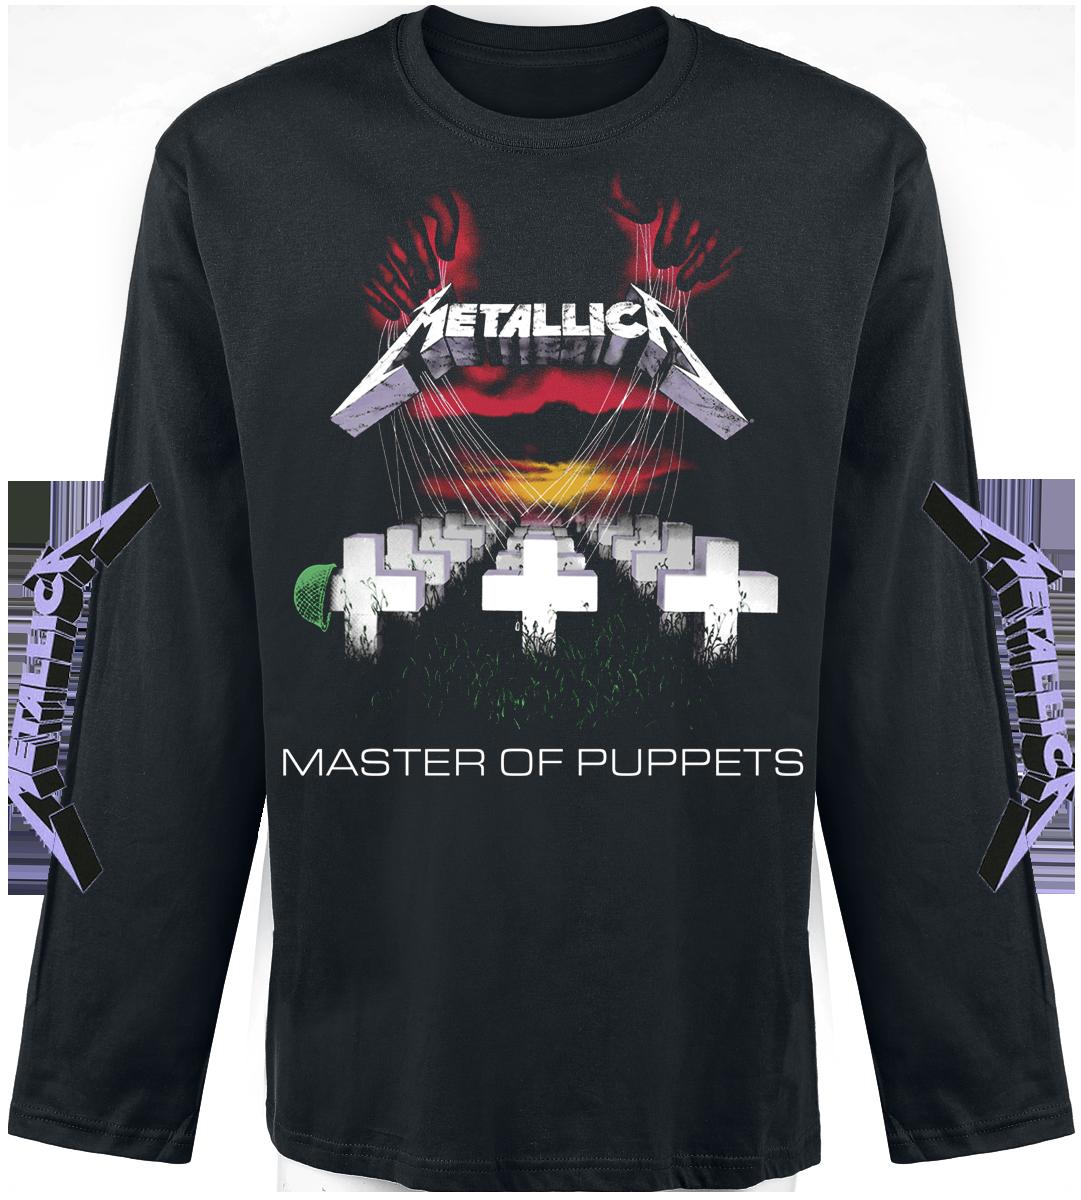 Metallica - Master Of Puppets - Longsleeve - black image